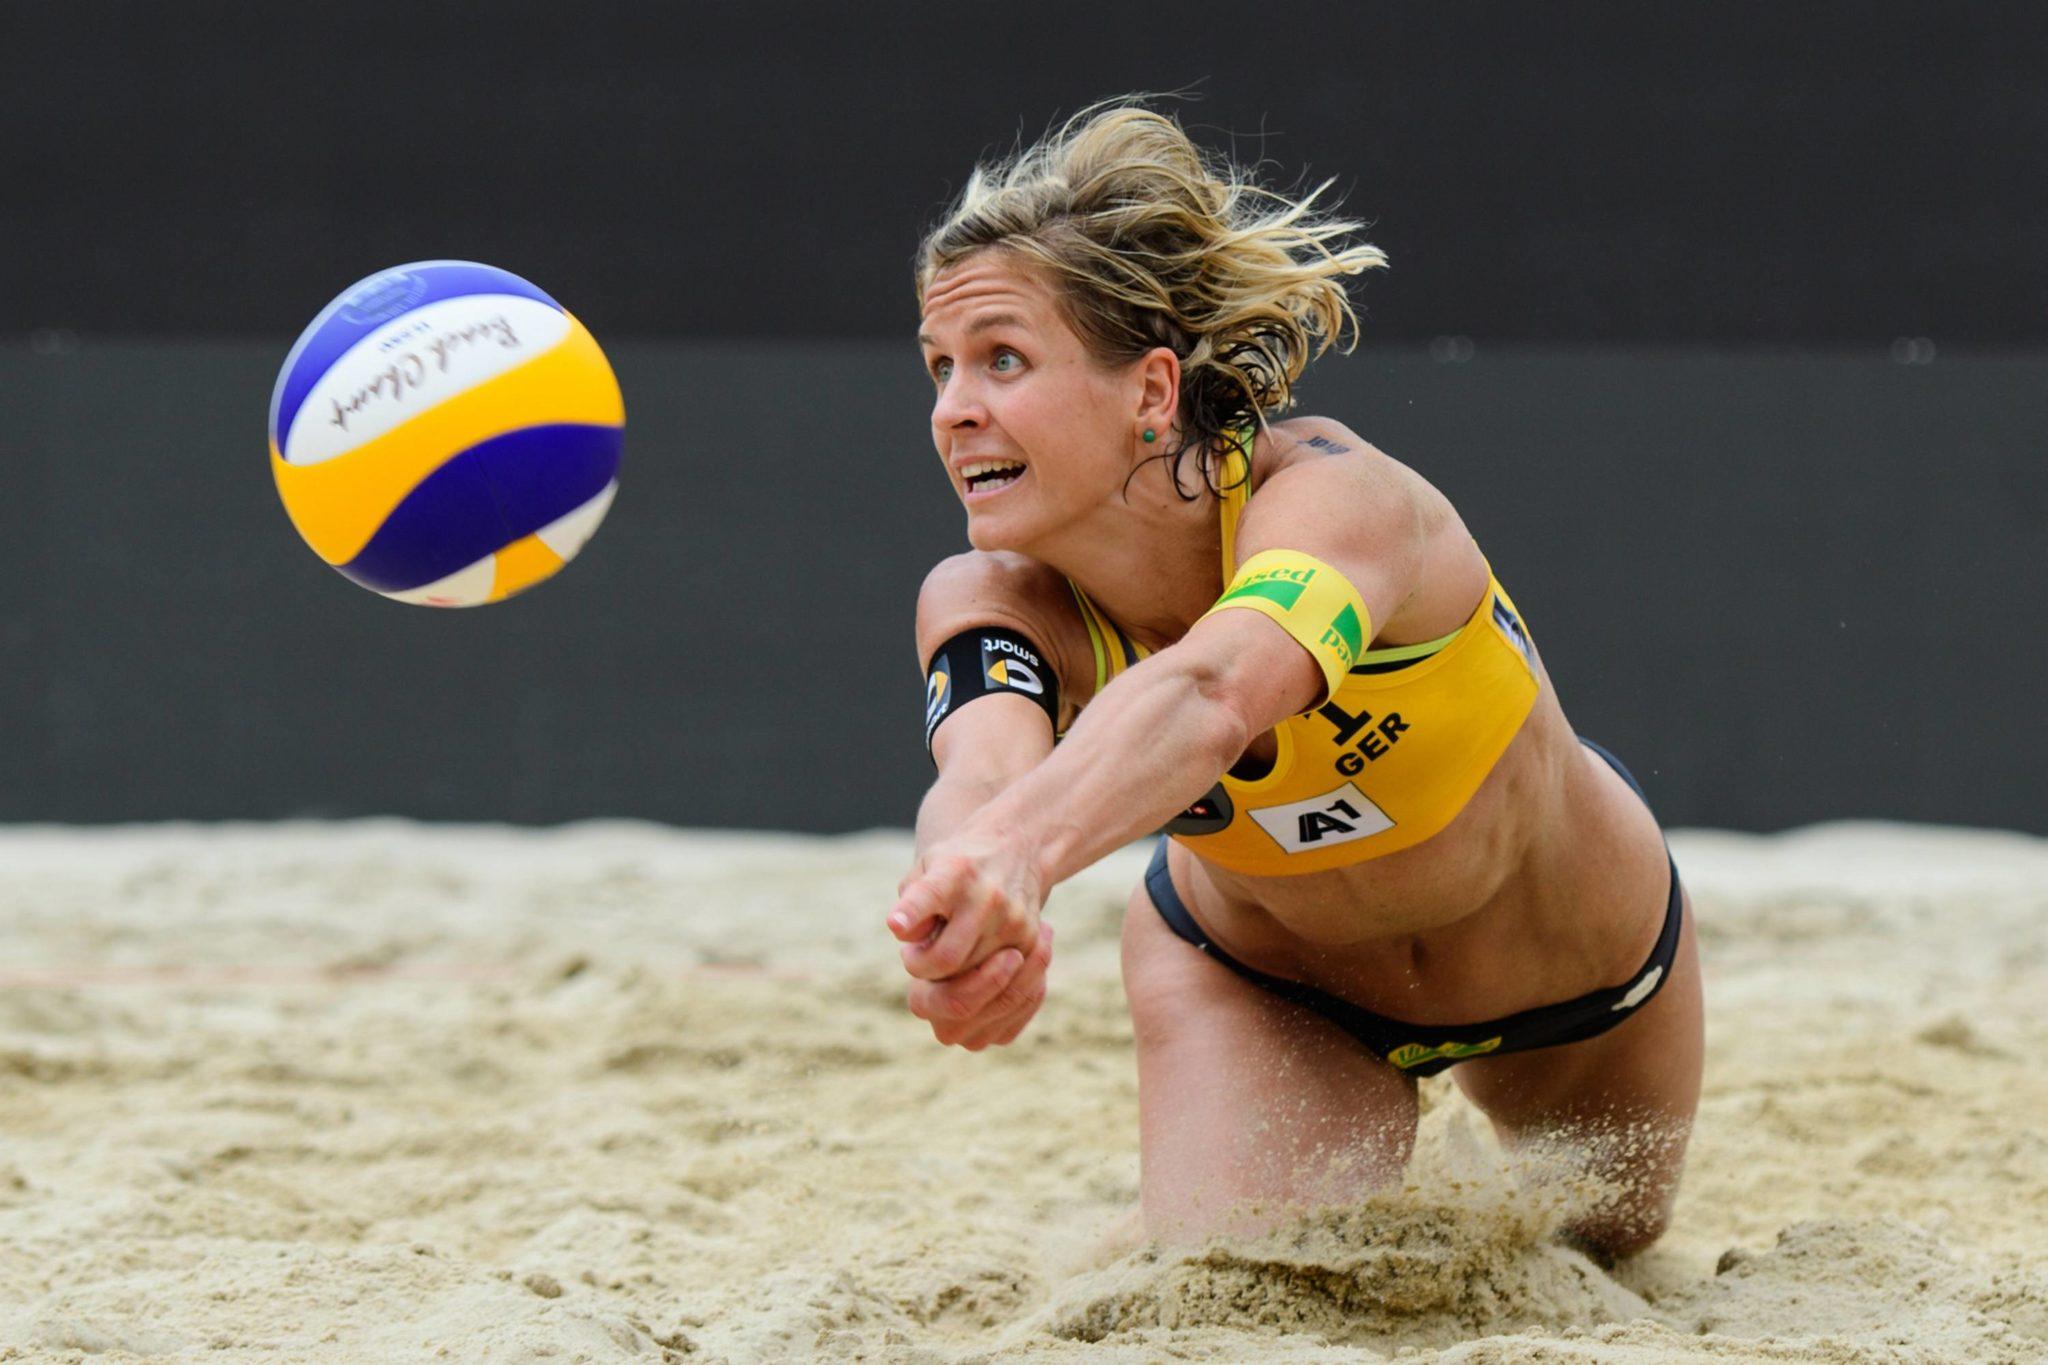 Defending Gold Medalists Headline Beach Worlds Women S Semifinals